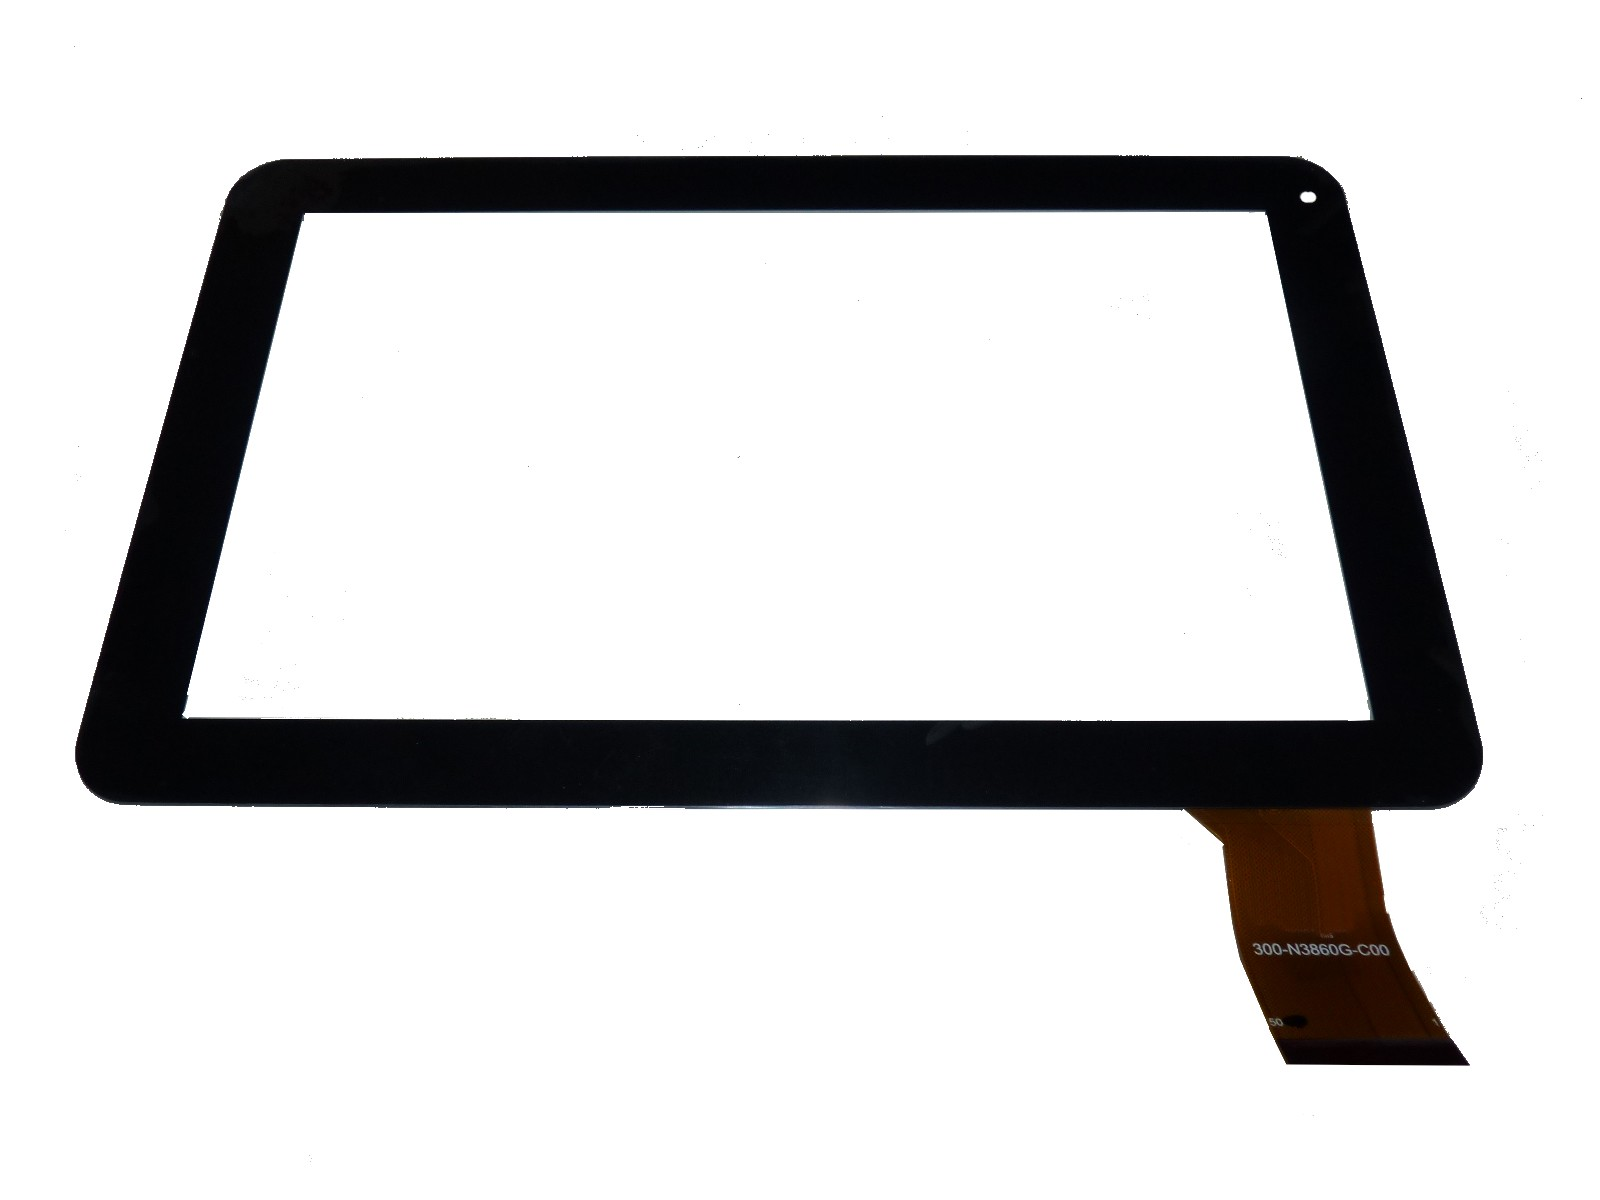 ecran tactile pour tablette polaroid storex mpman logicom lenco etc ecran tactile. Black Bedroom Furniture Sets. Home Design Ideas